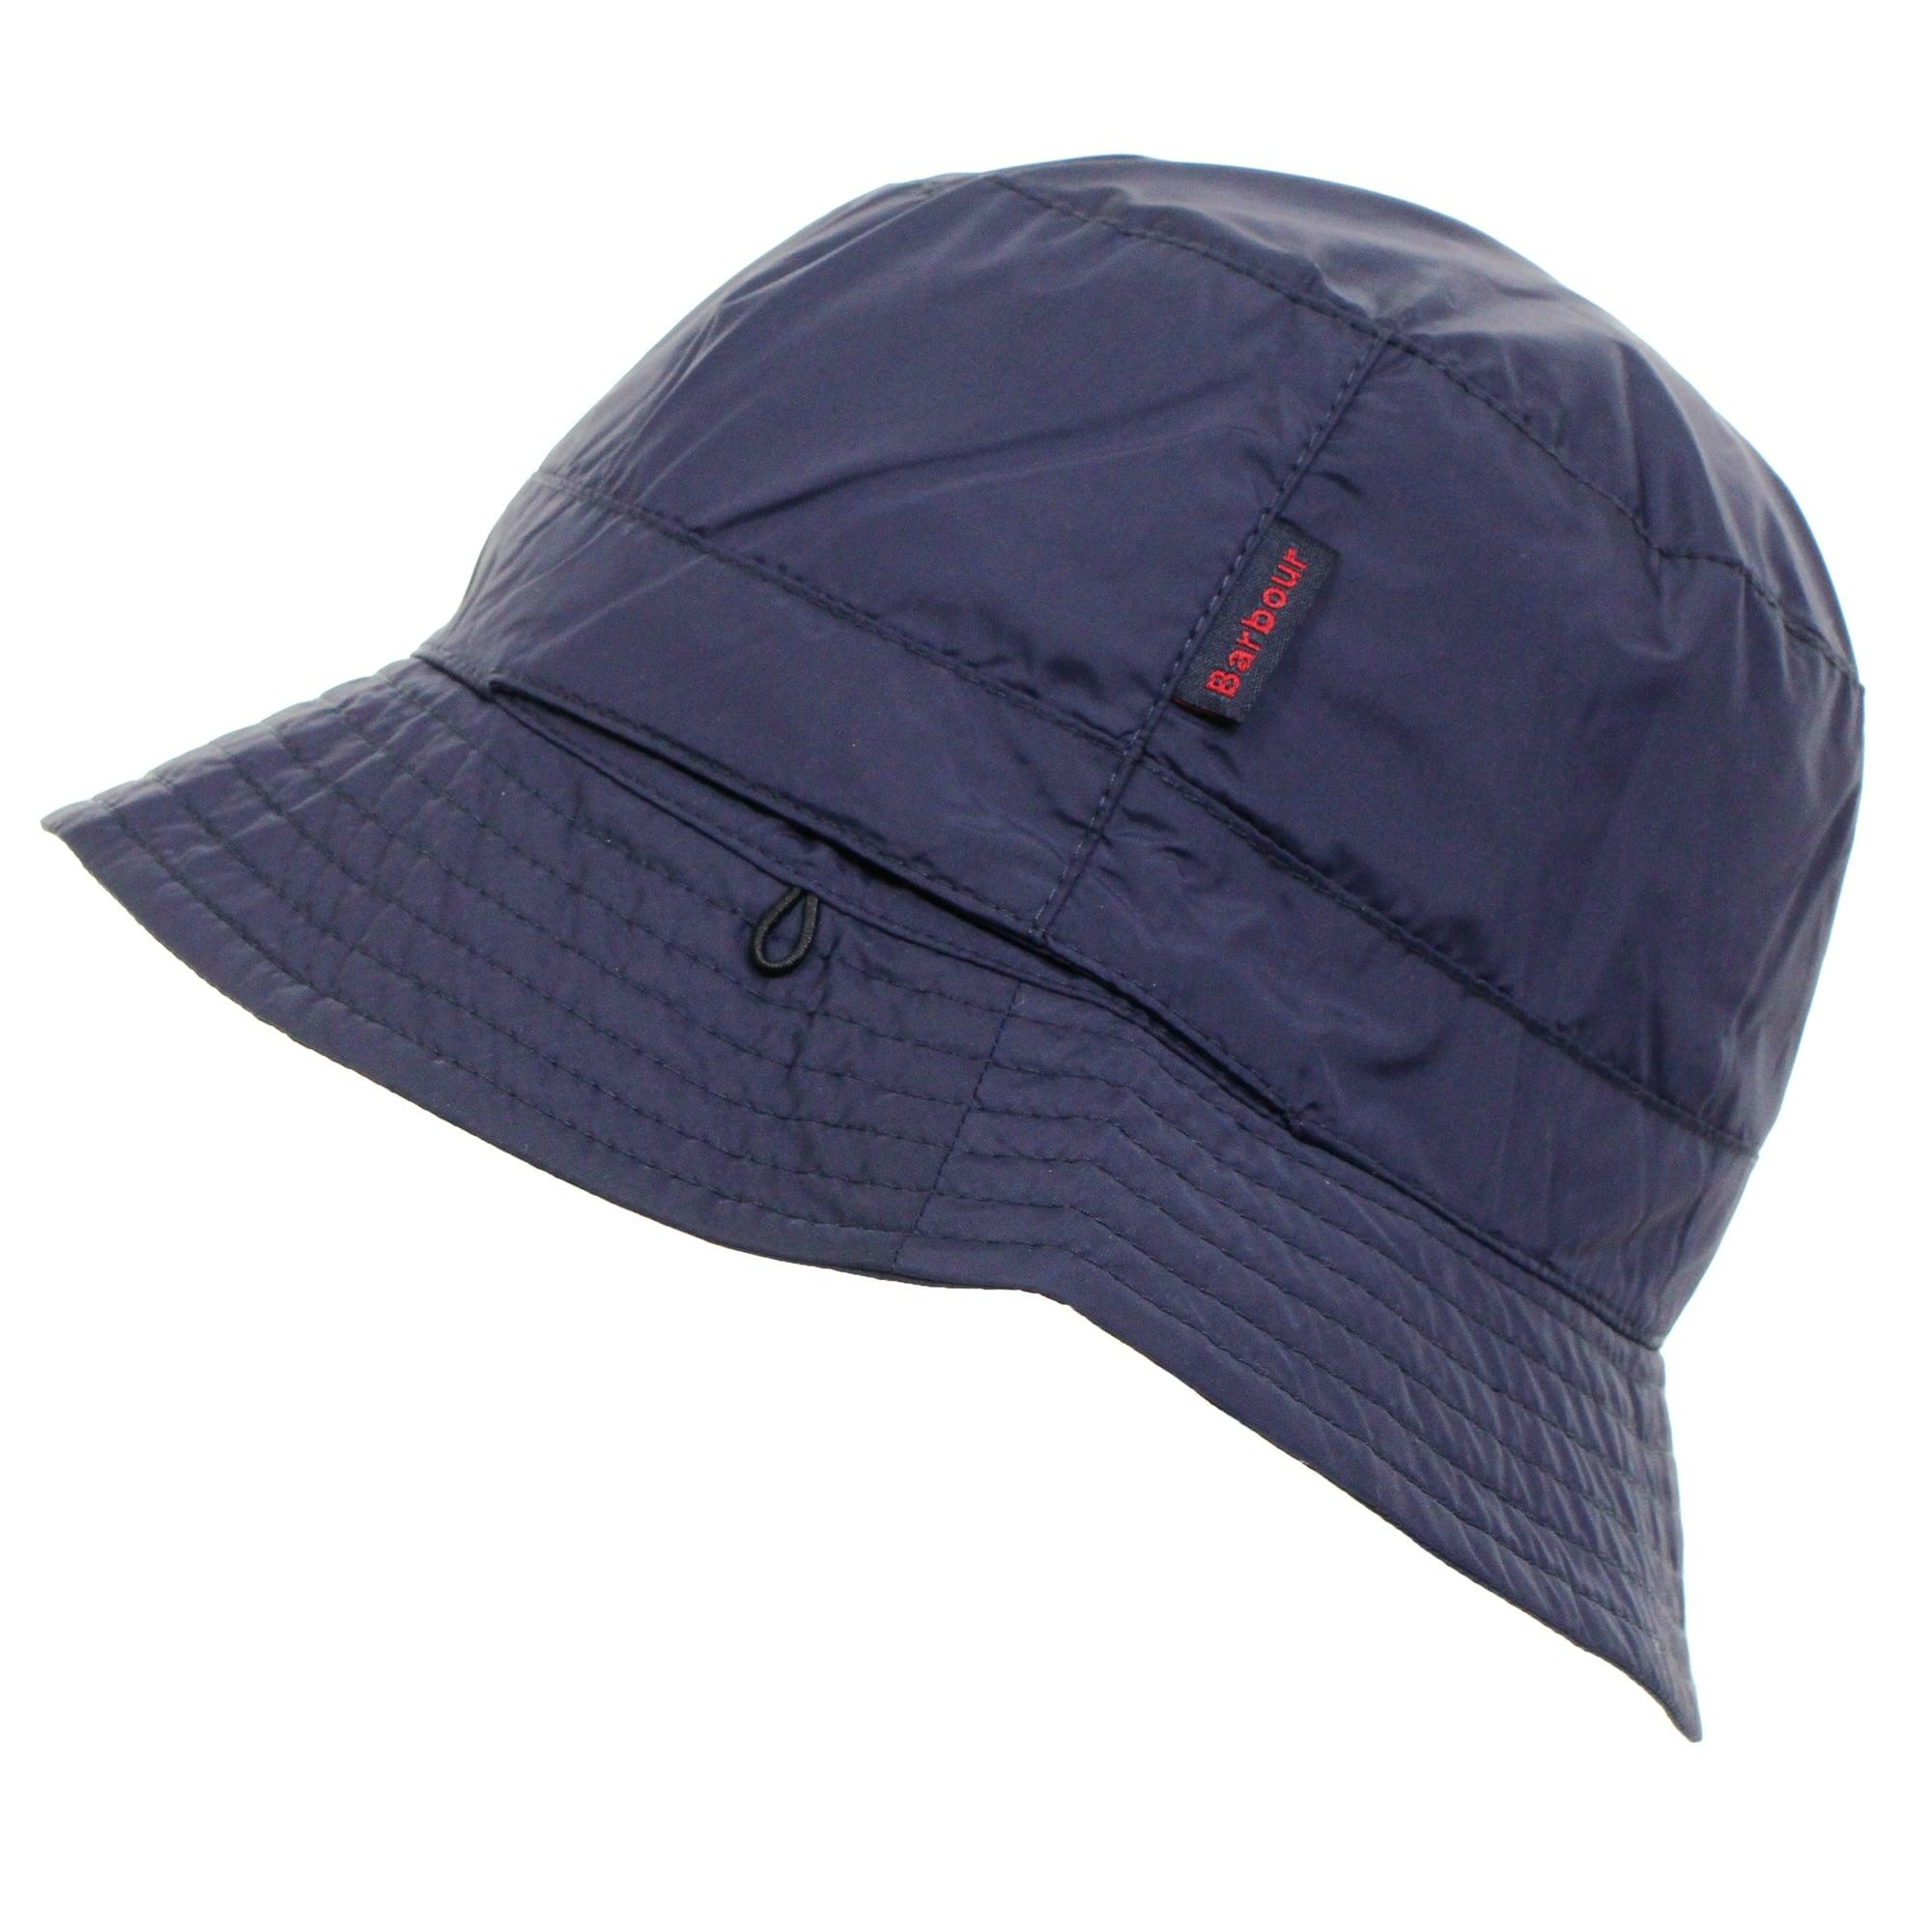 3eed5cd1 Barbour - Blue Taran Bucket Hat for Men - Lyst. View fullscreen